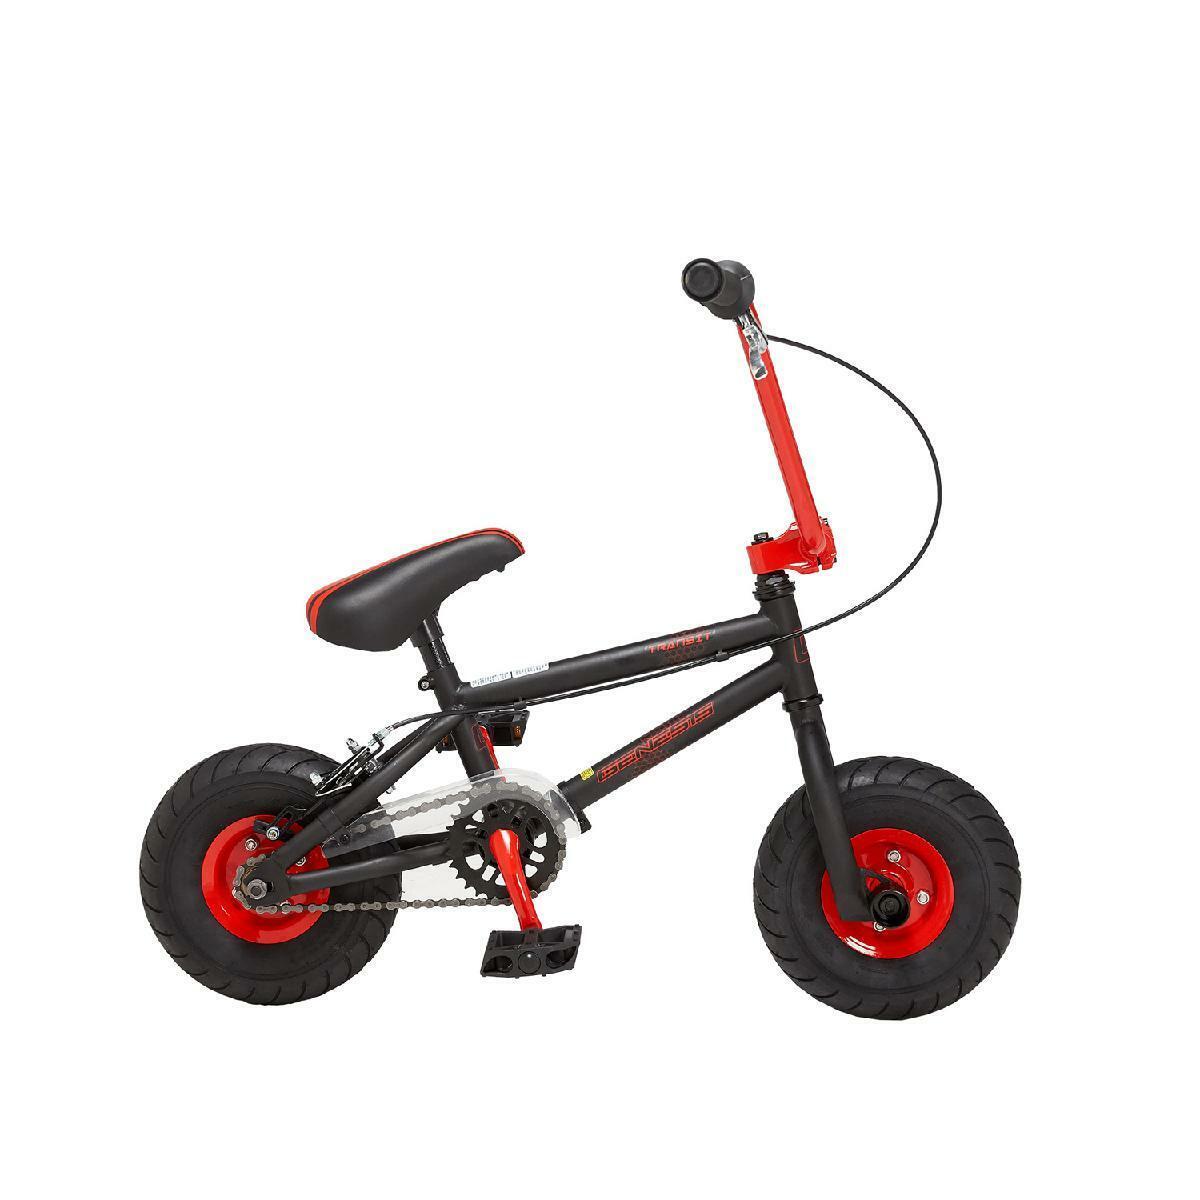 "Prometheus 12"" Kids Bicycle Bike with Training Wheels Green New"